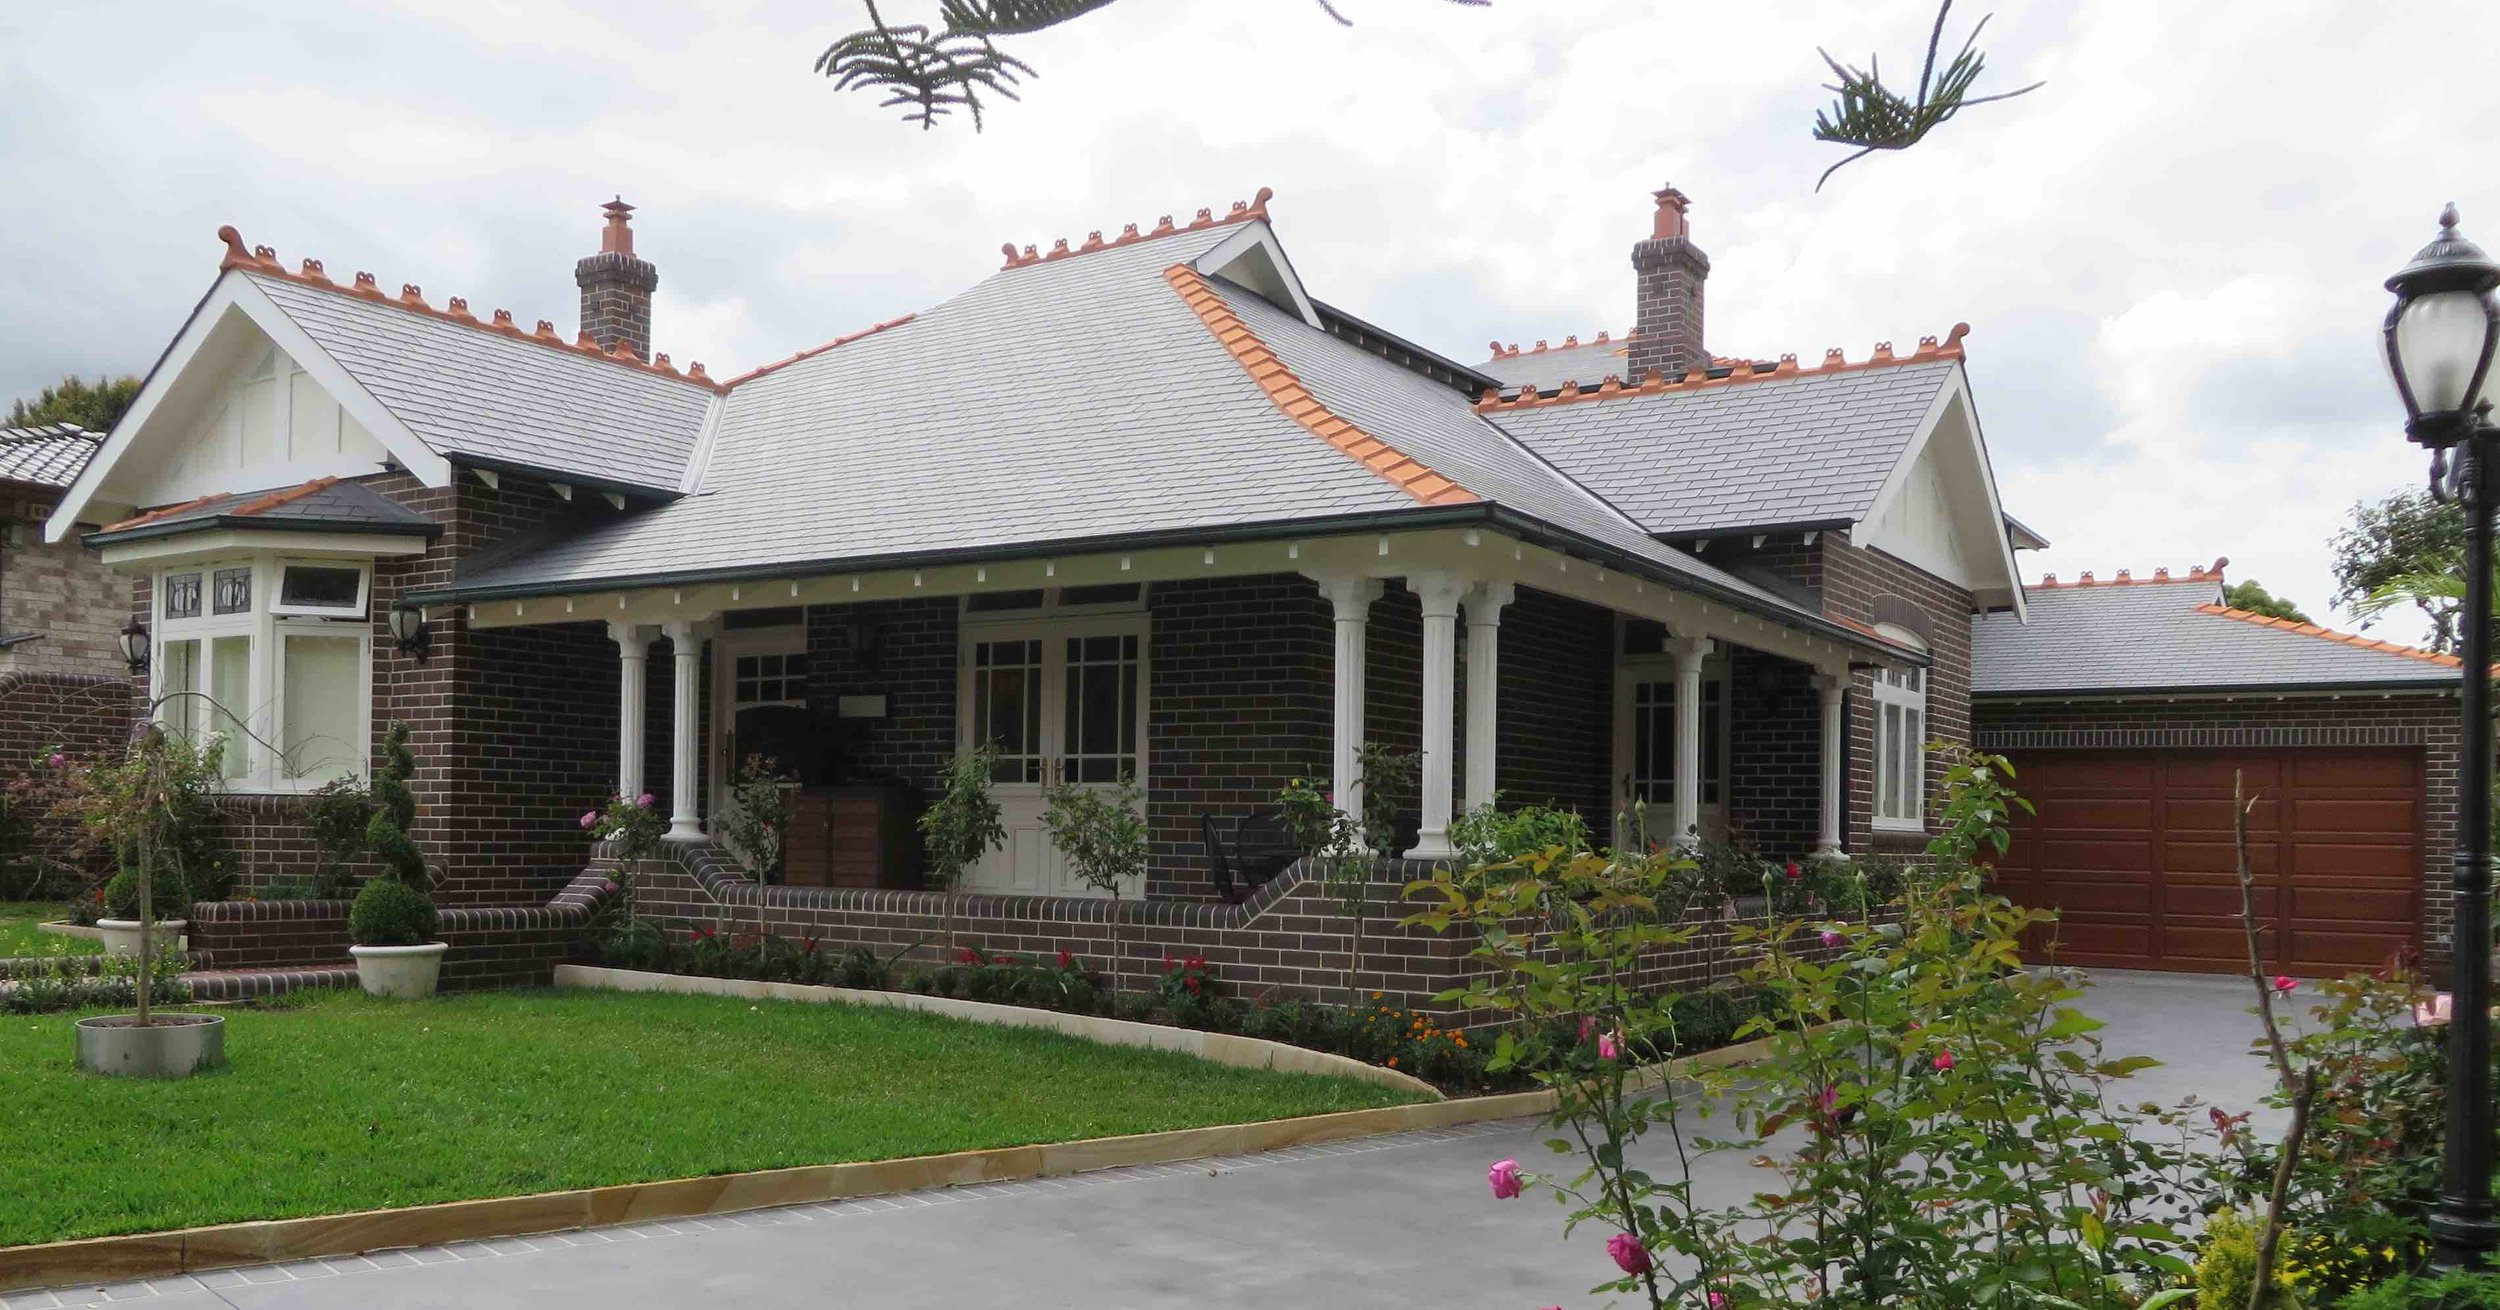 Tapco Inspire Slate Roofing - Burwood, Sydney